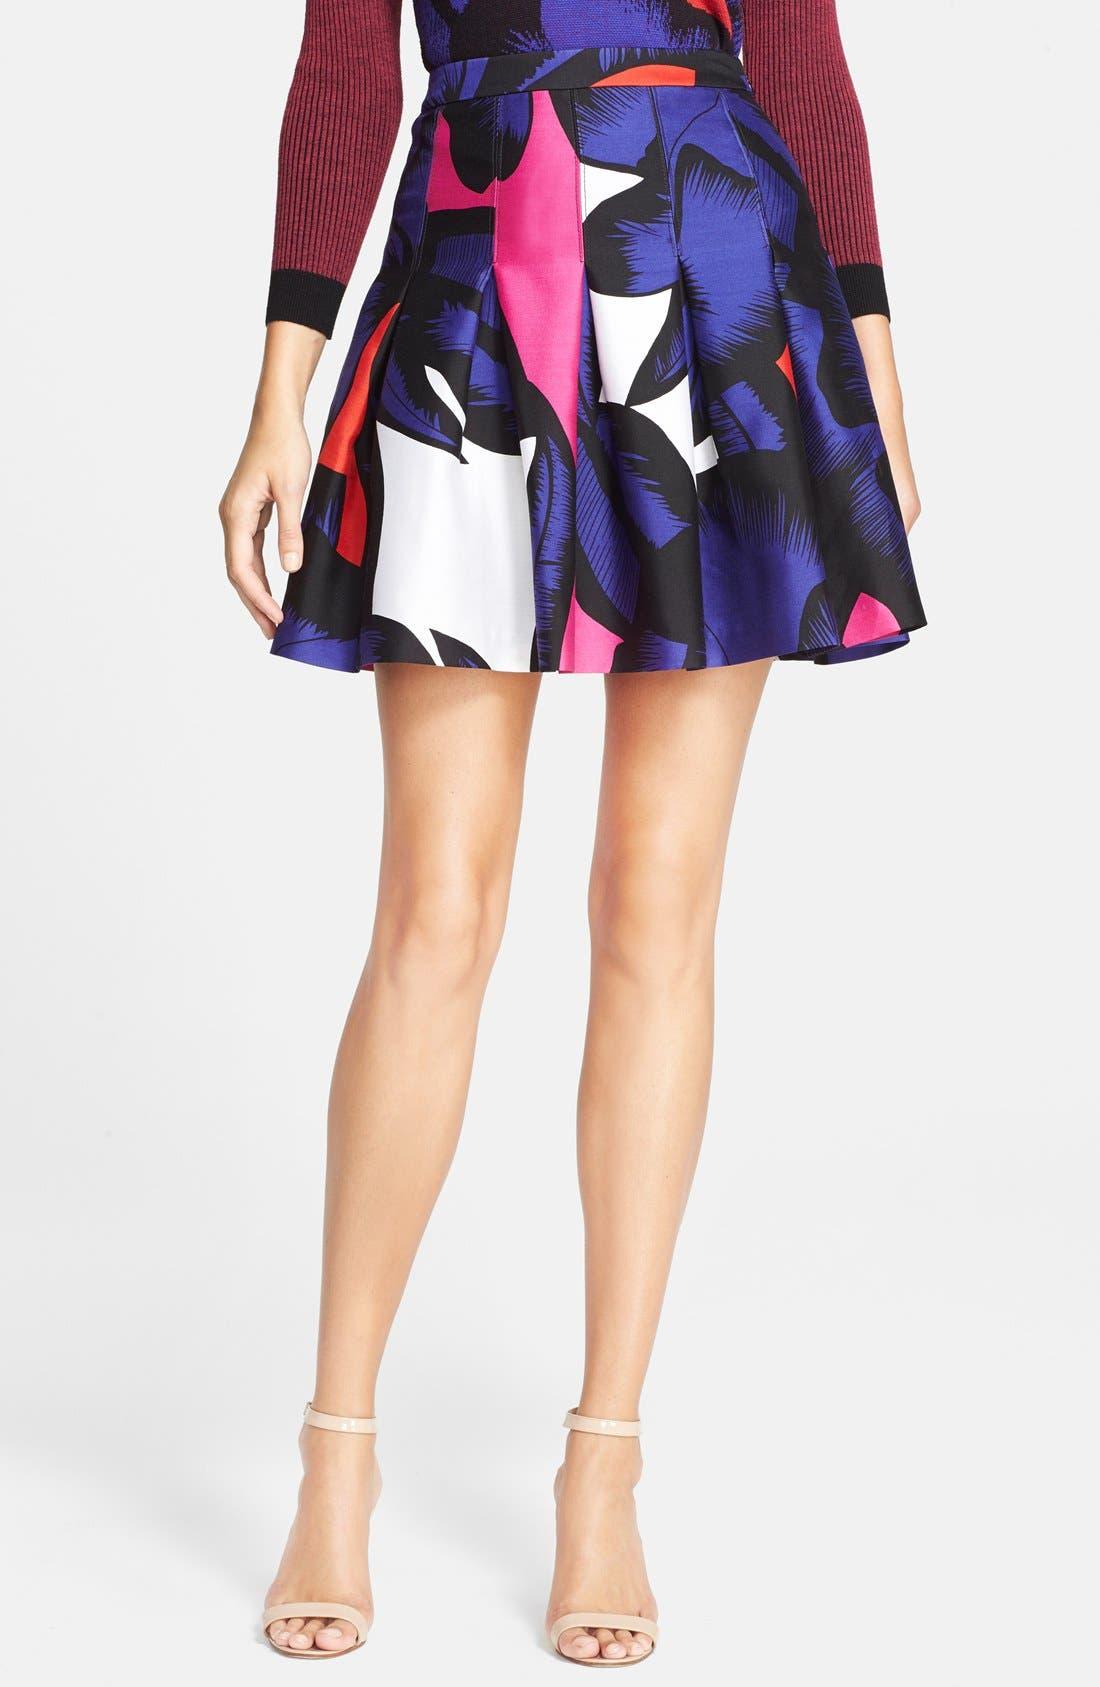 DIANE VON FURSTENBERG, 'Gemma' Print Pleated Skirt, Main thumbnail 1, color, 500